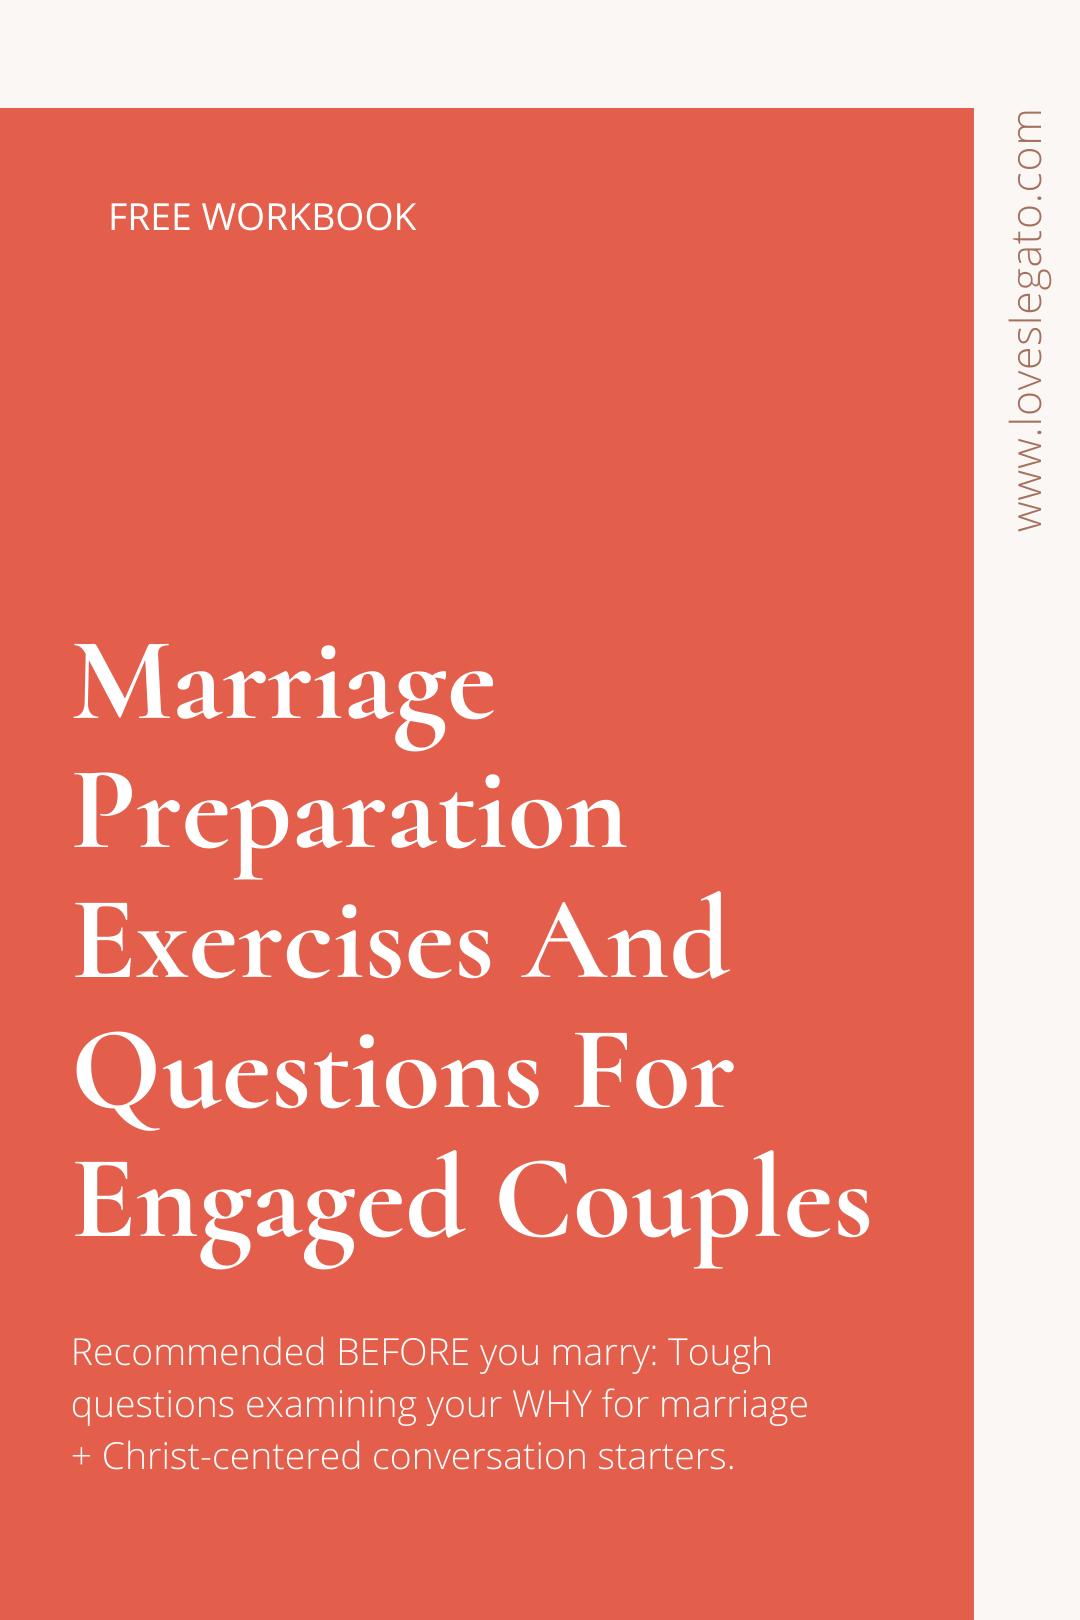 Pin On Premarital Counseling Tips